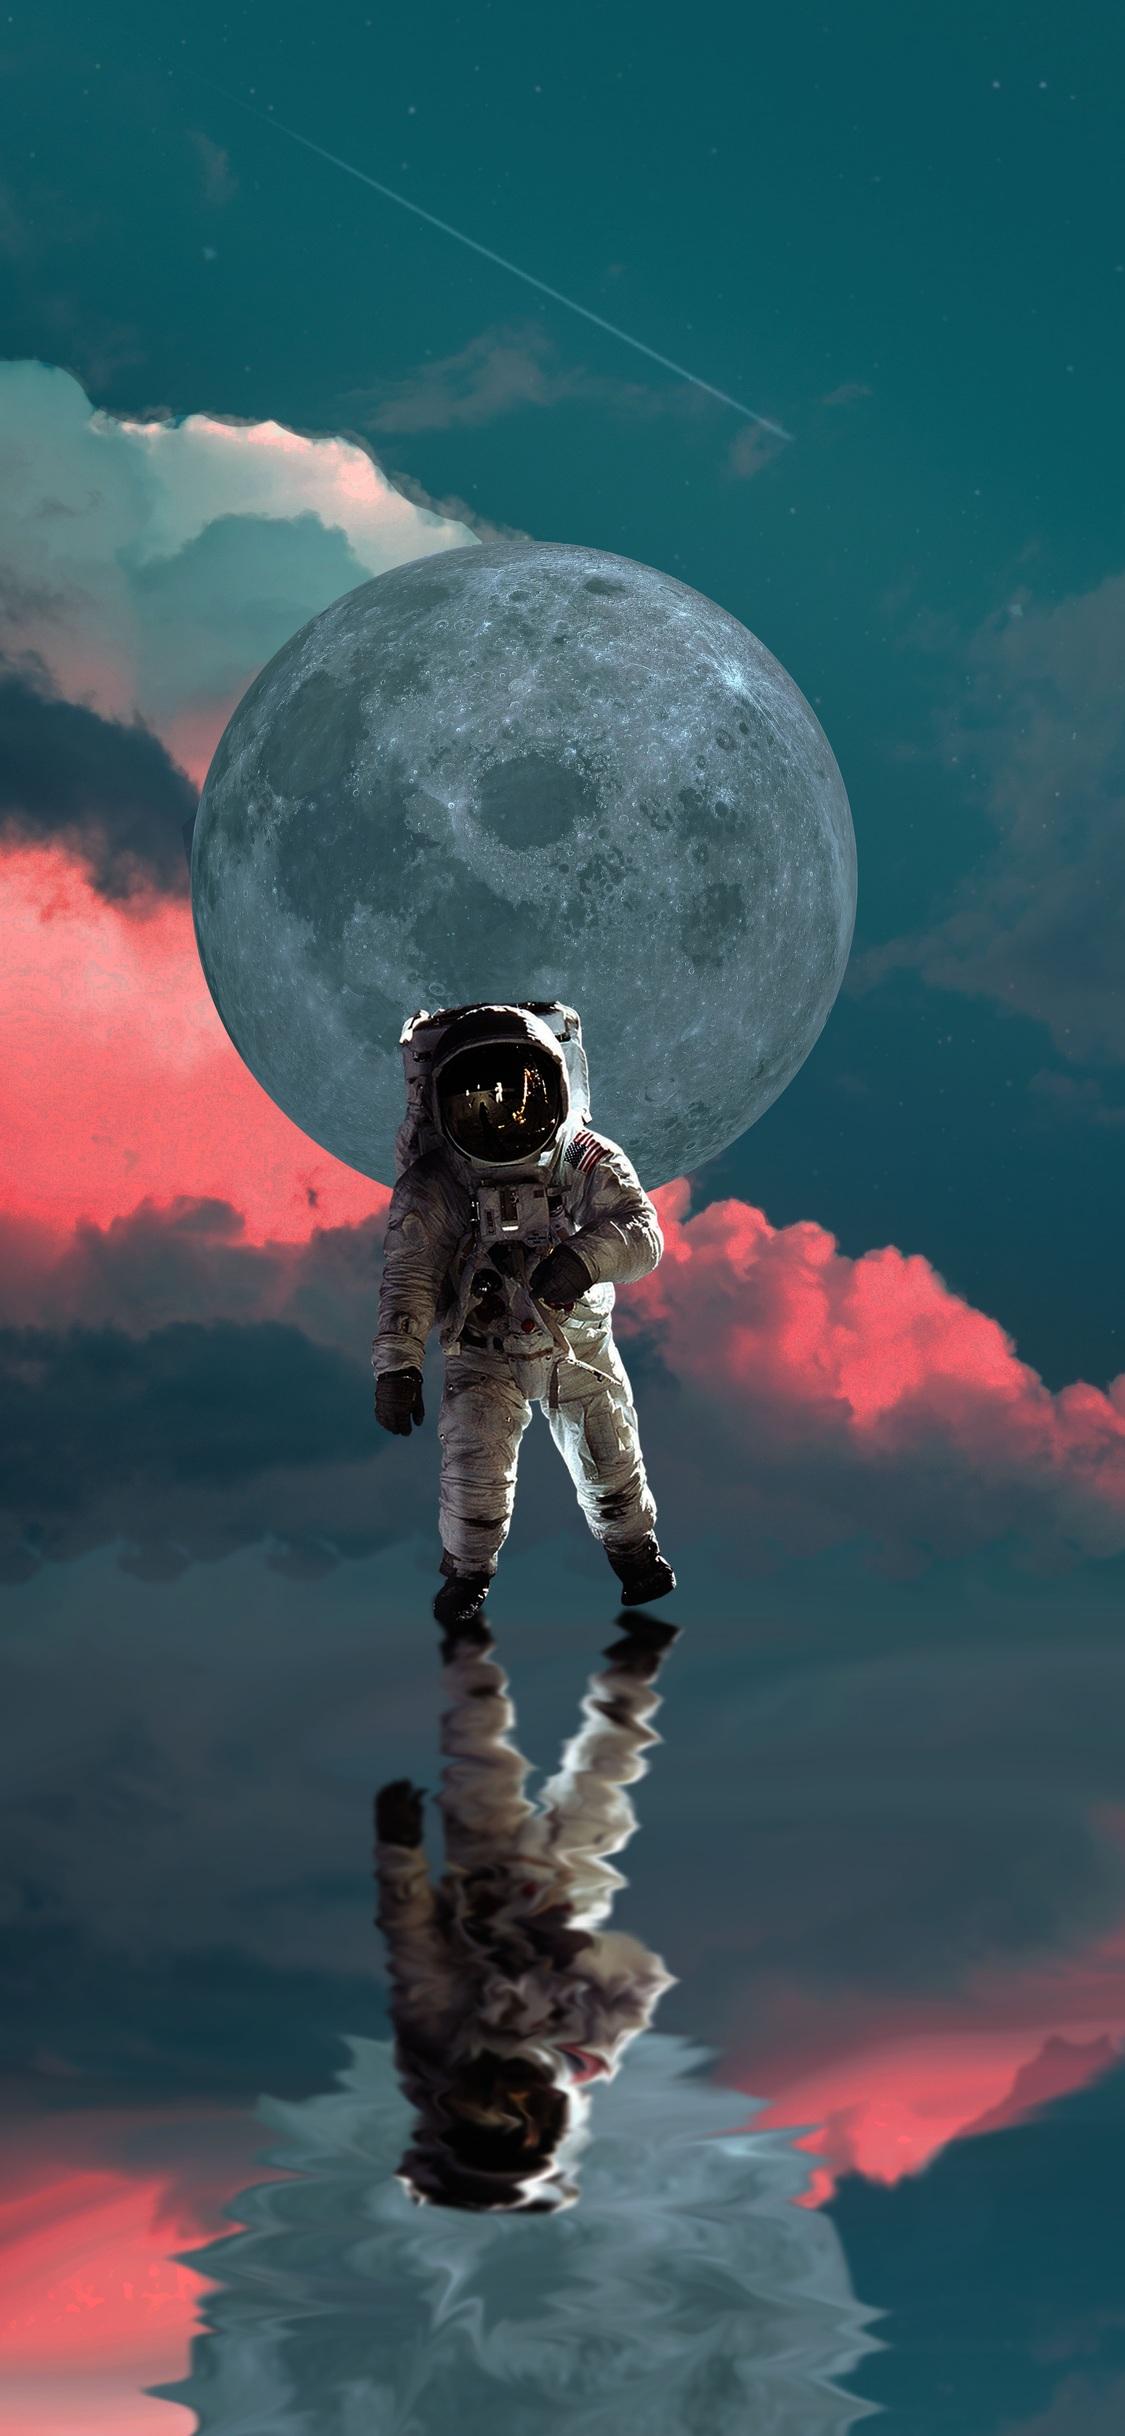 1125x2436 An Astronaut 4k Iphone Xsiphone 10iphone X Hd 4k